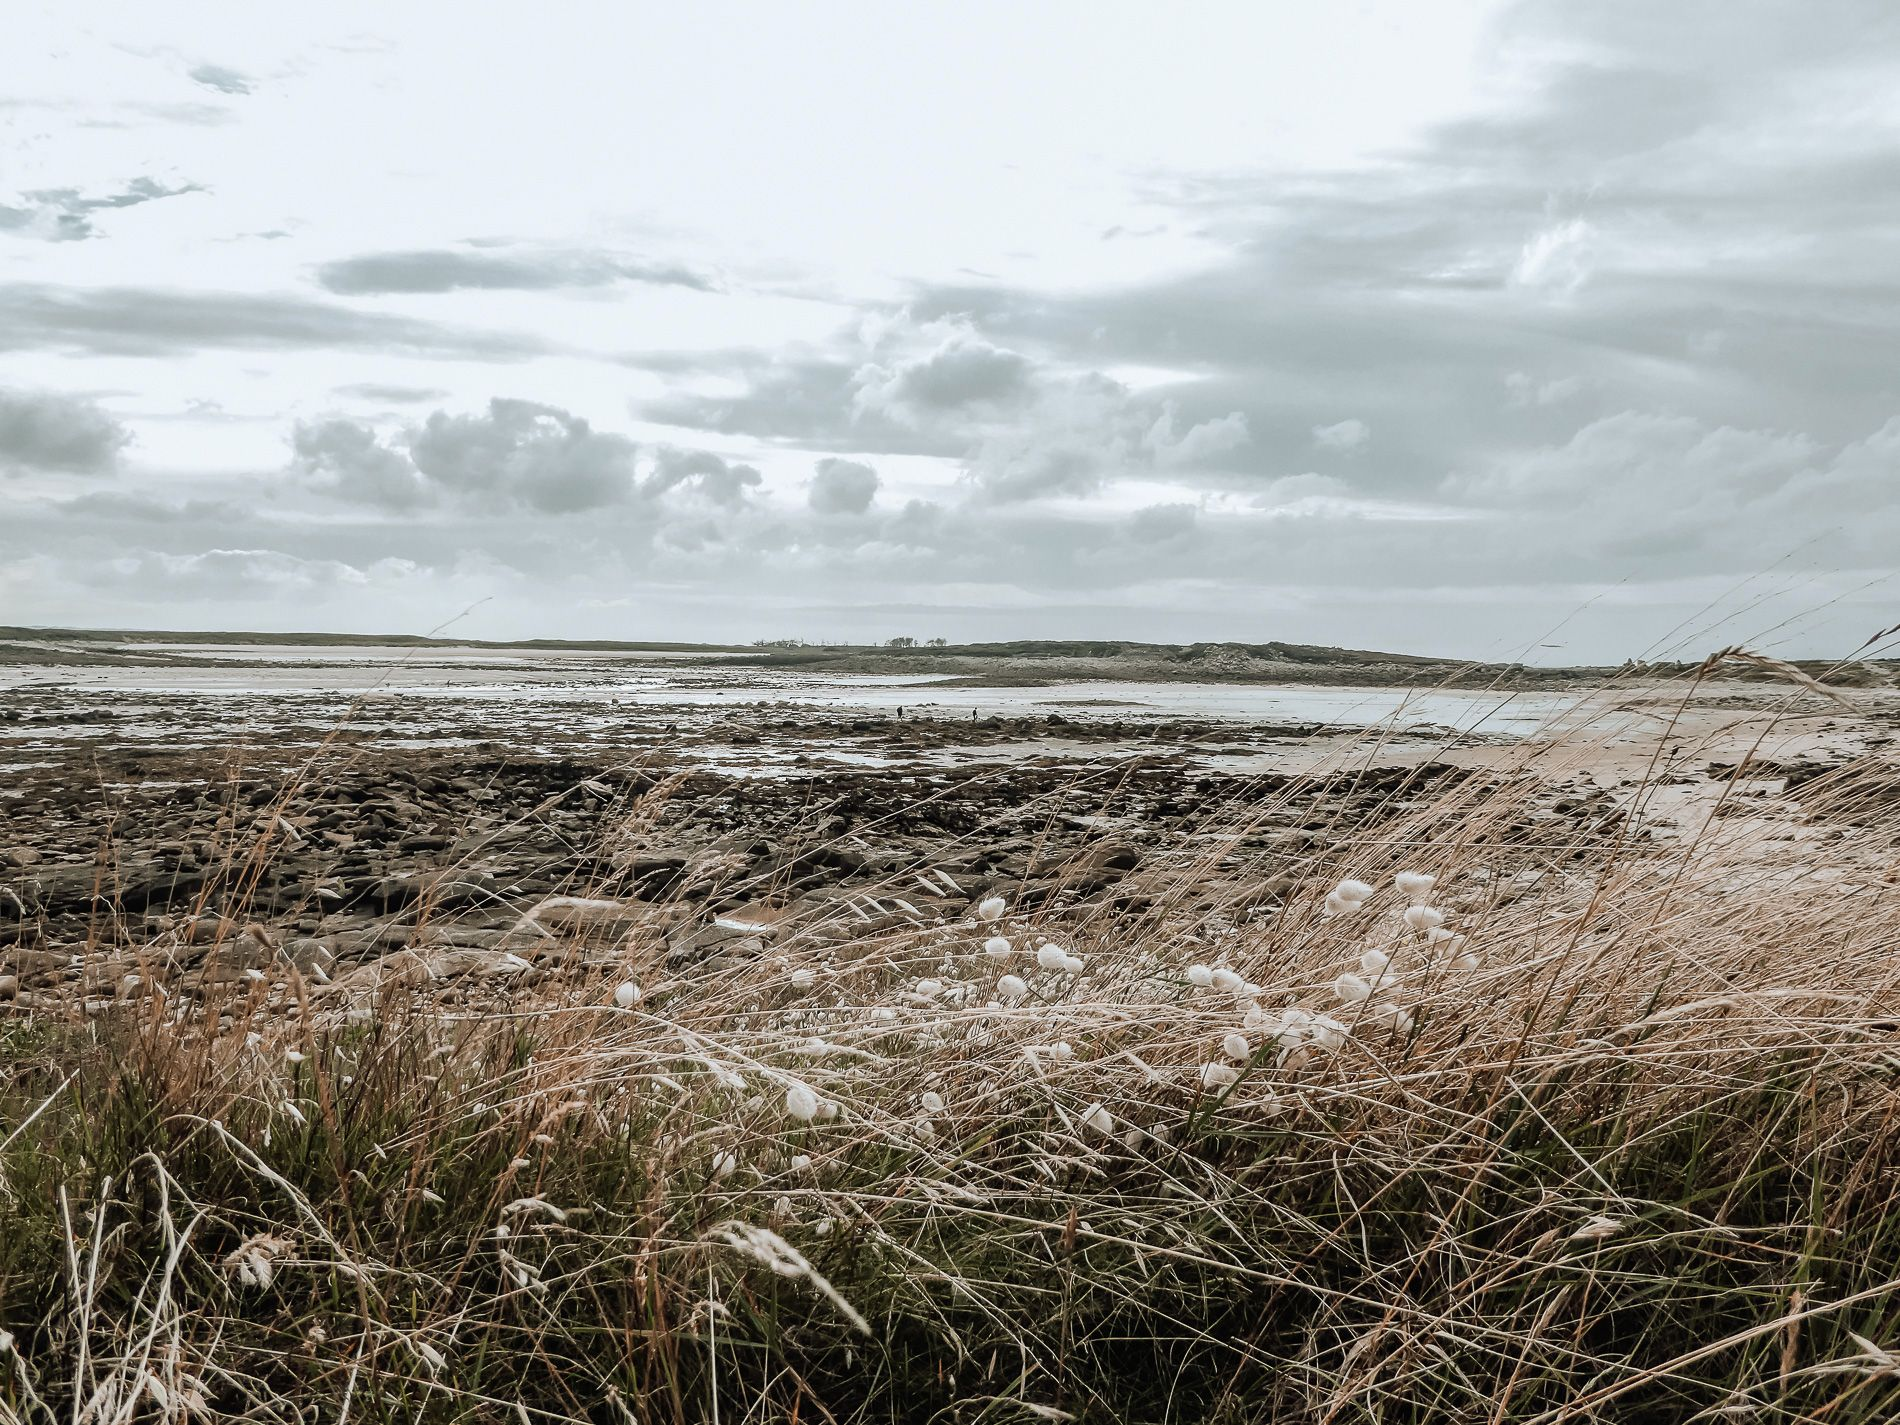 Bretagne - cote de granit rose - conseils - mademoiselle - voyage - blog - ile grande - trebeudun